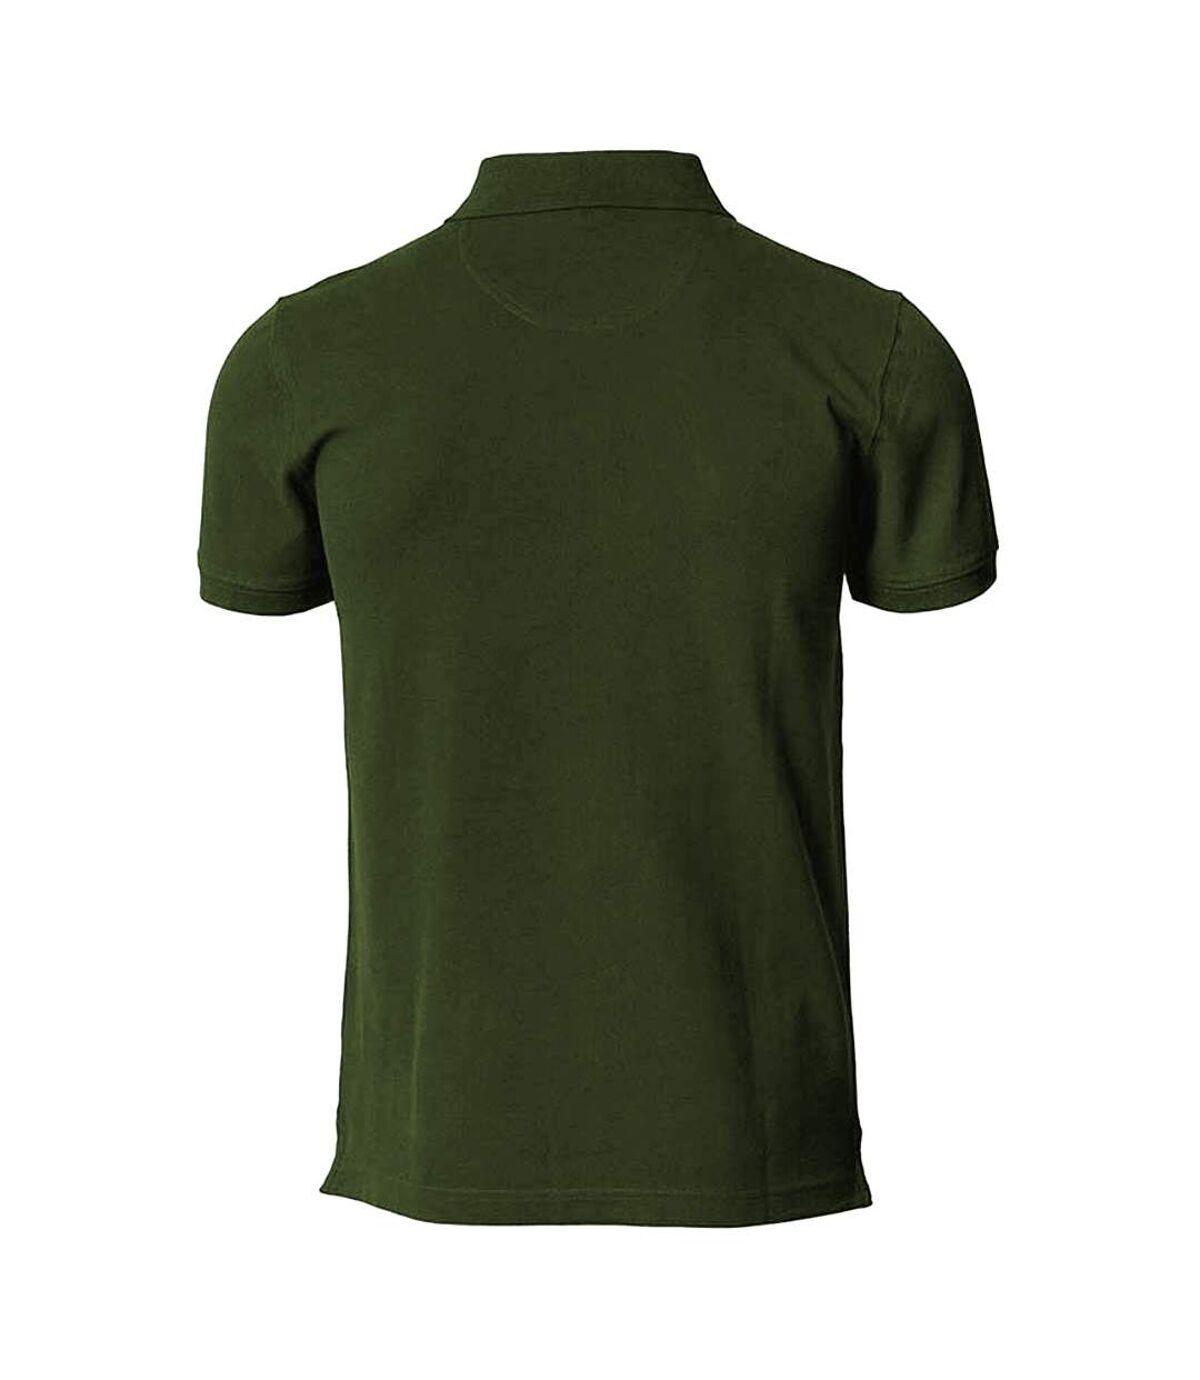 Nimbus Mens Harvard Stretch Deluxe Polo Shirt (Olive) - UTRW5148